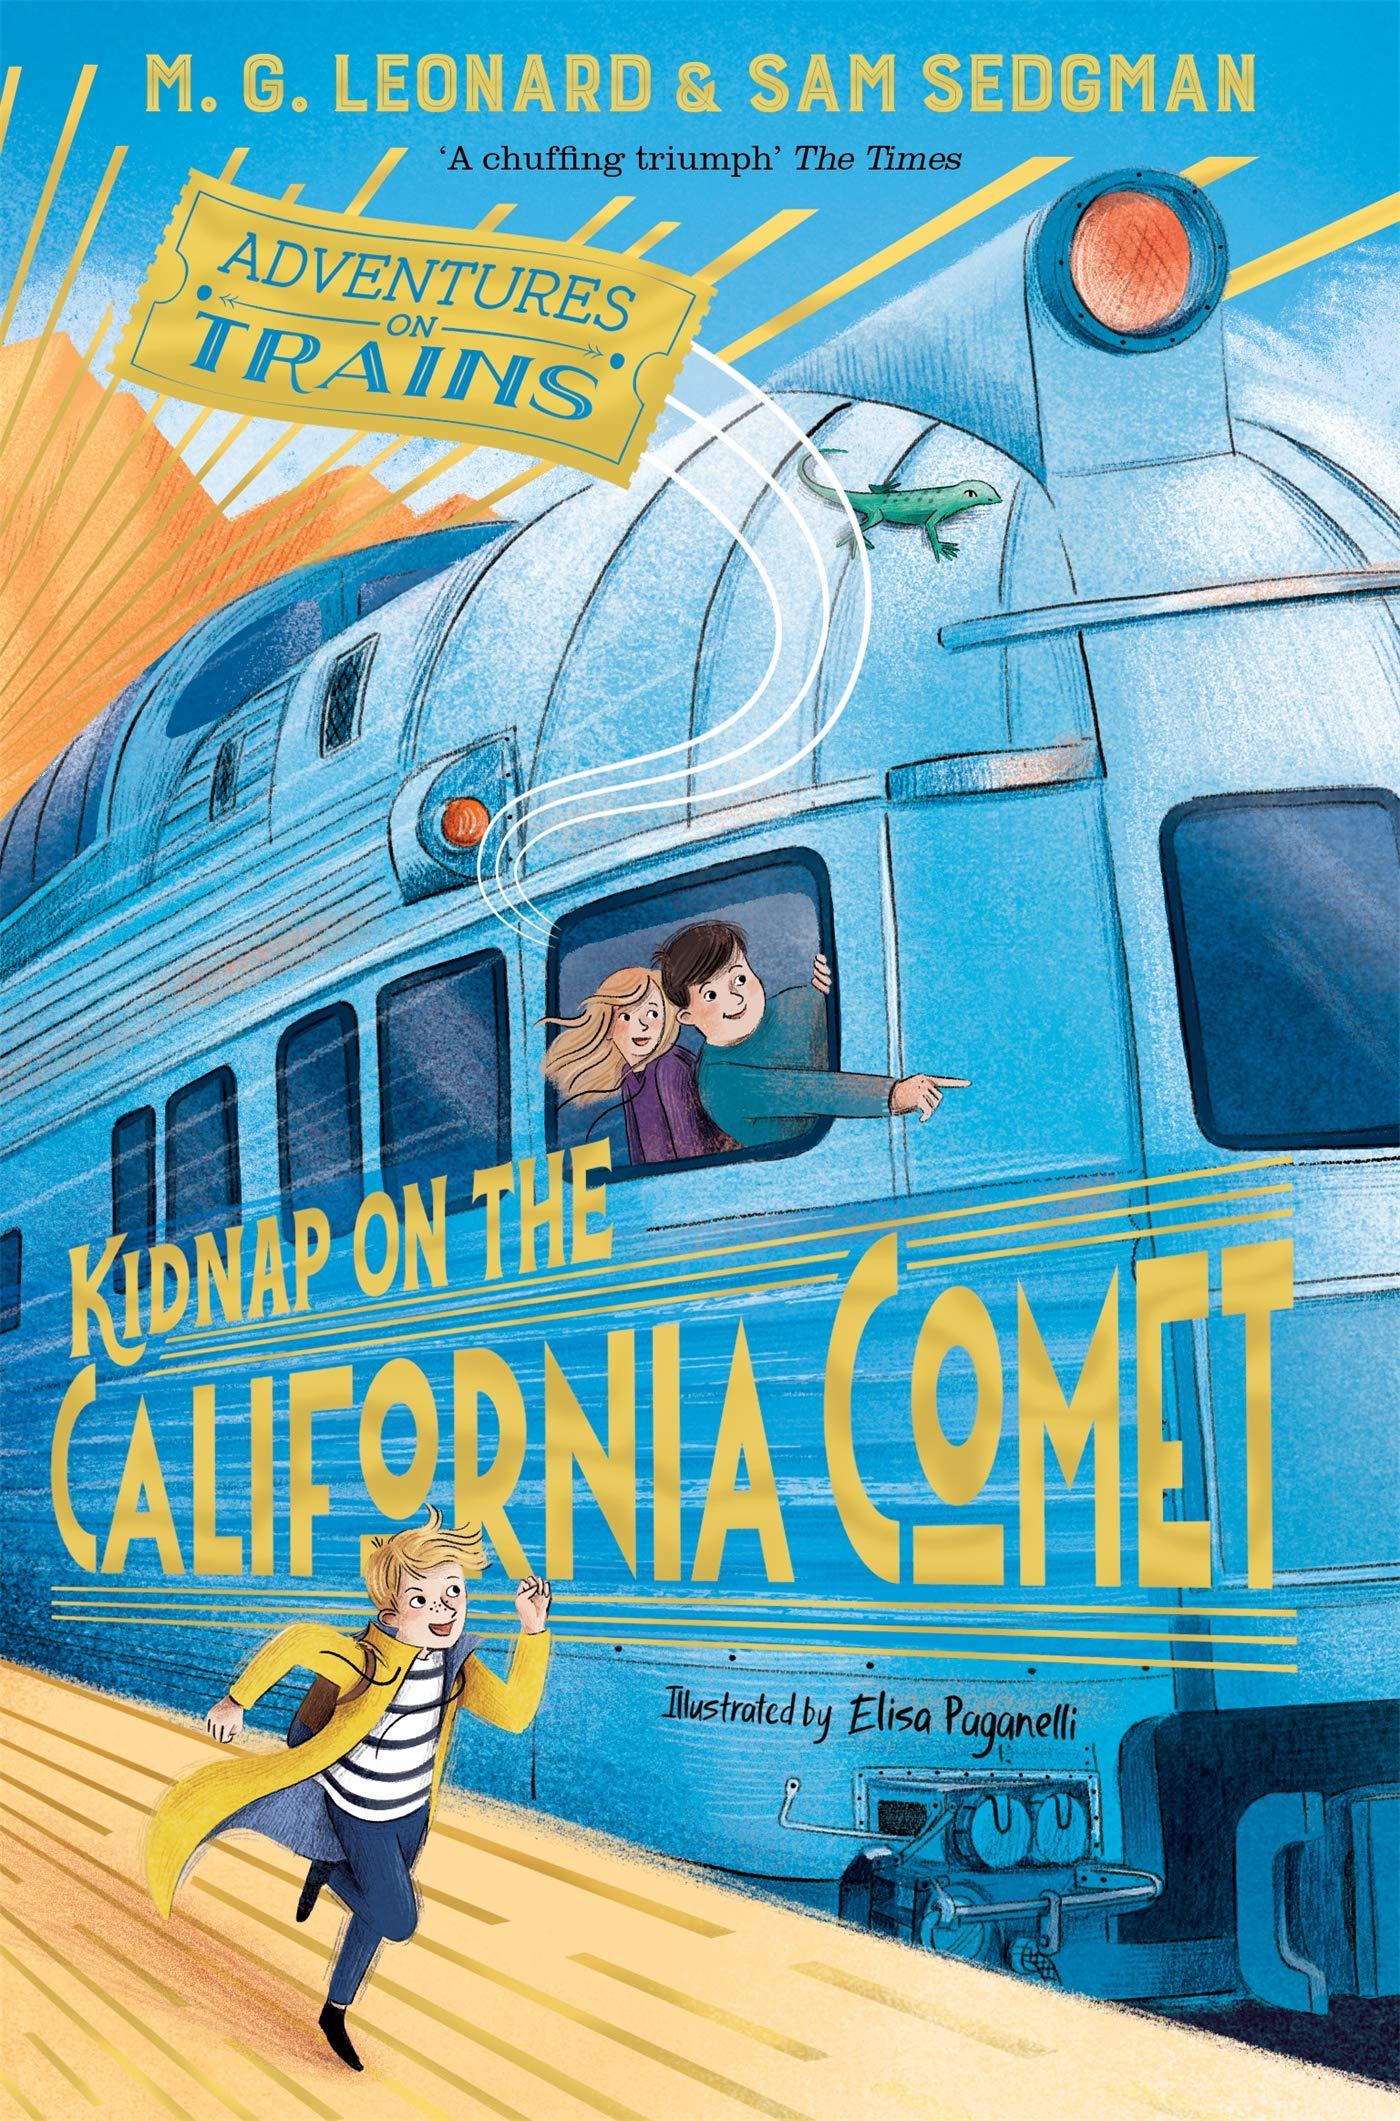 Kidnap on the California Comet Adventures on Trains: Amazon.co.uk: Leonard,  M. G., Sedgman, Sam, Paganelli, Elisa: Books